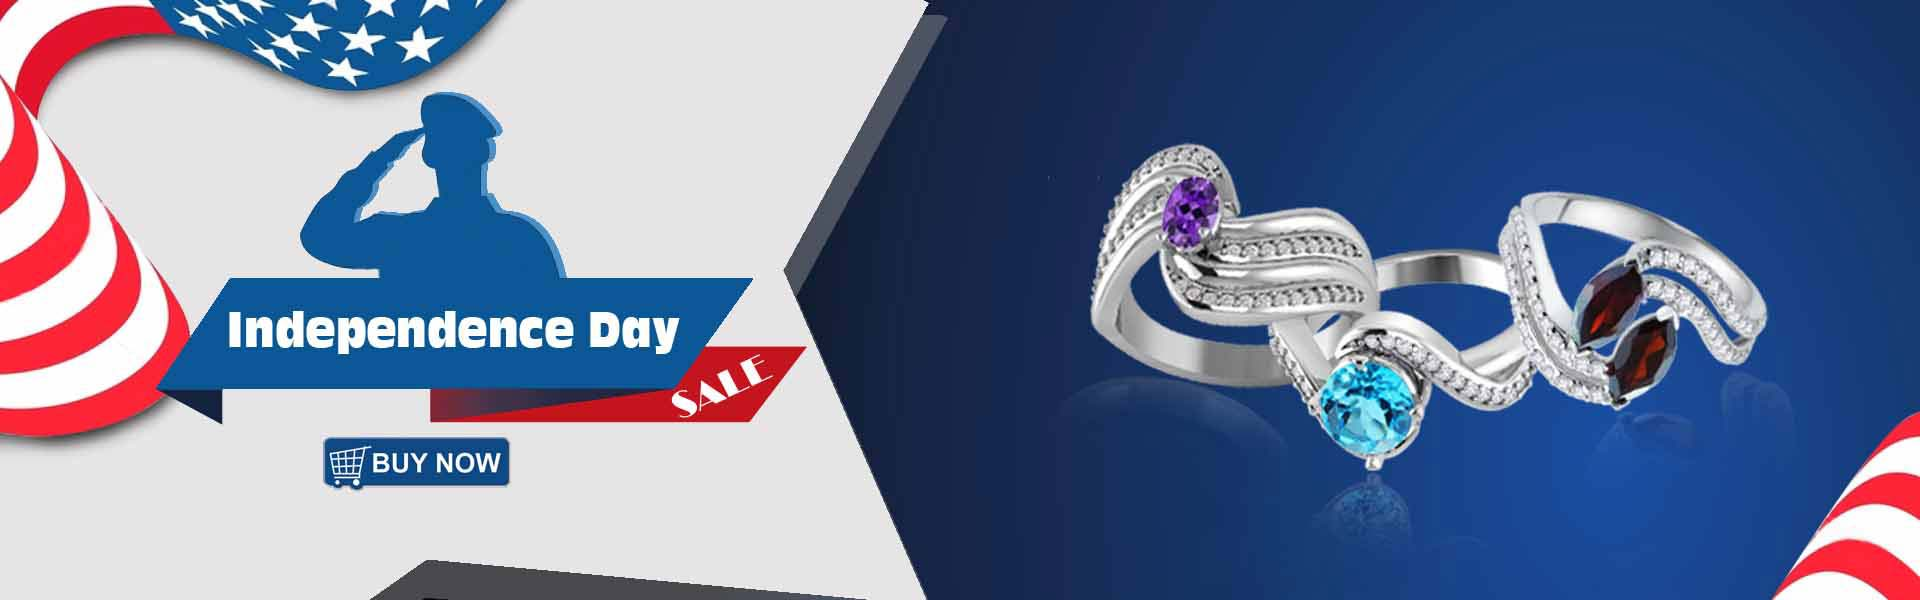 independence day jewelry sale at belinda jewelz